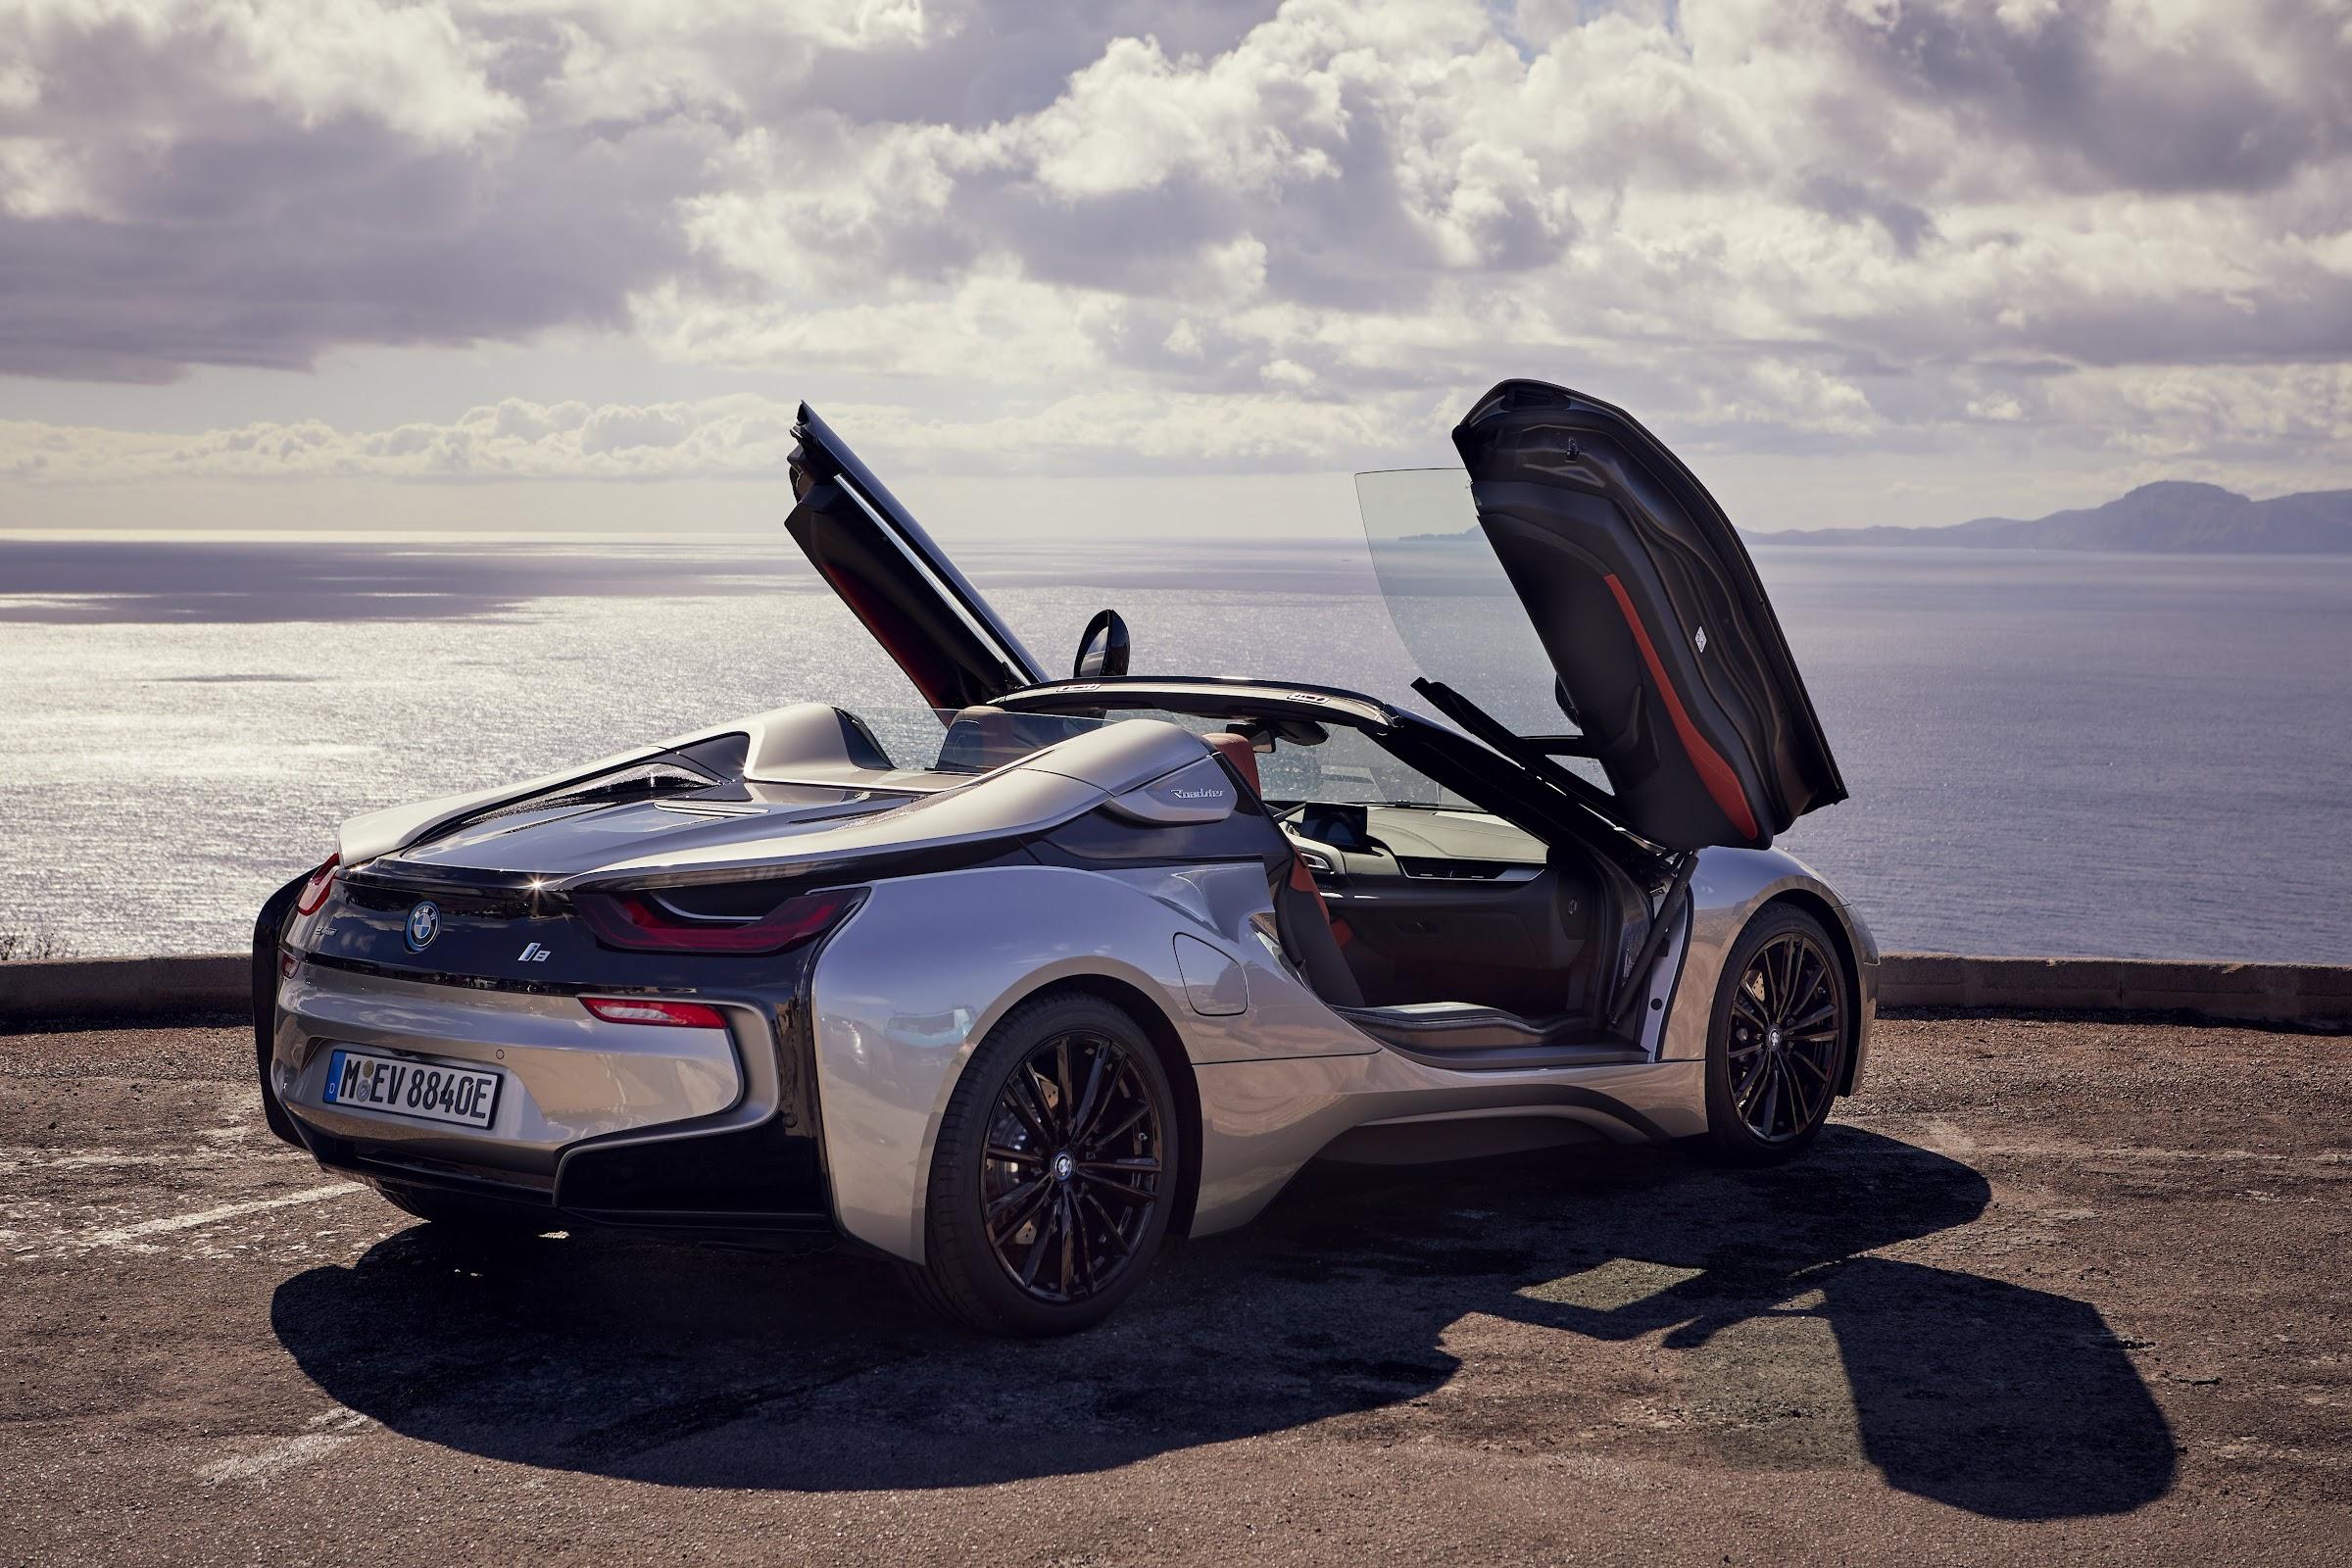 0y8Faky3b5 Ae DVt7USoroQduoa1meD38V2CNHix9ksXn4KeAGI3G2bekla90sKV4tq2XO33EPMQIO3MtGf7p82DVzjyKokToJn0cz5avBmDY3jtCIQasOe1a1N7uIZt15pdWjTlw=w2400 - El BMW i8 Roadster se exhibe por Mallorca (fotografías y video)